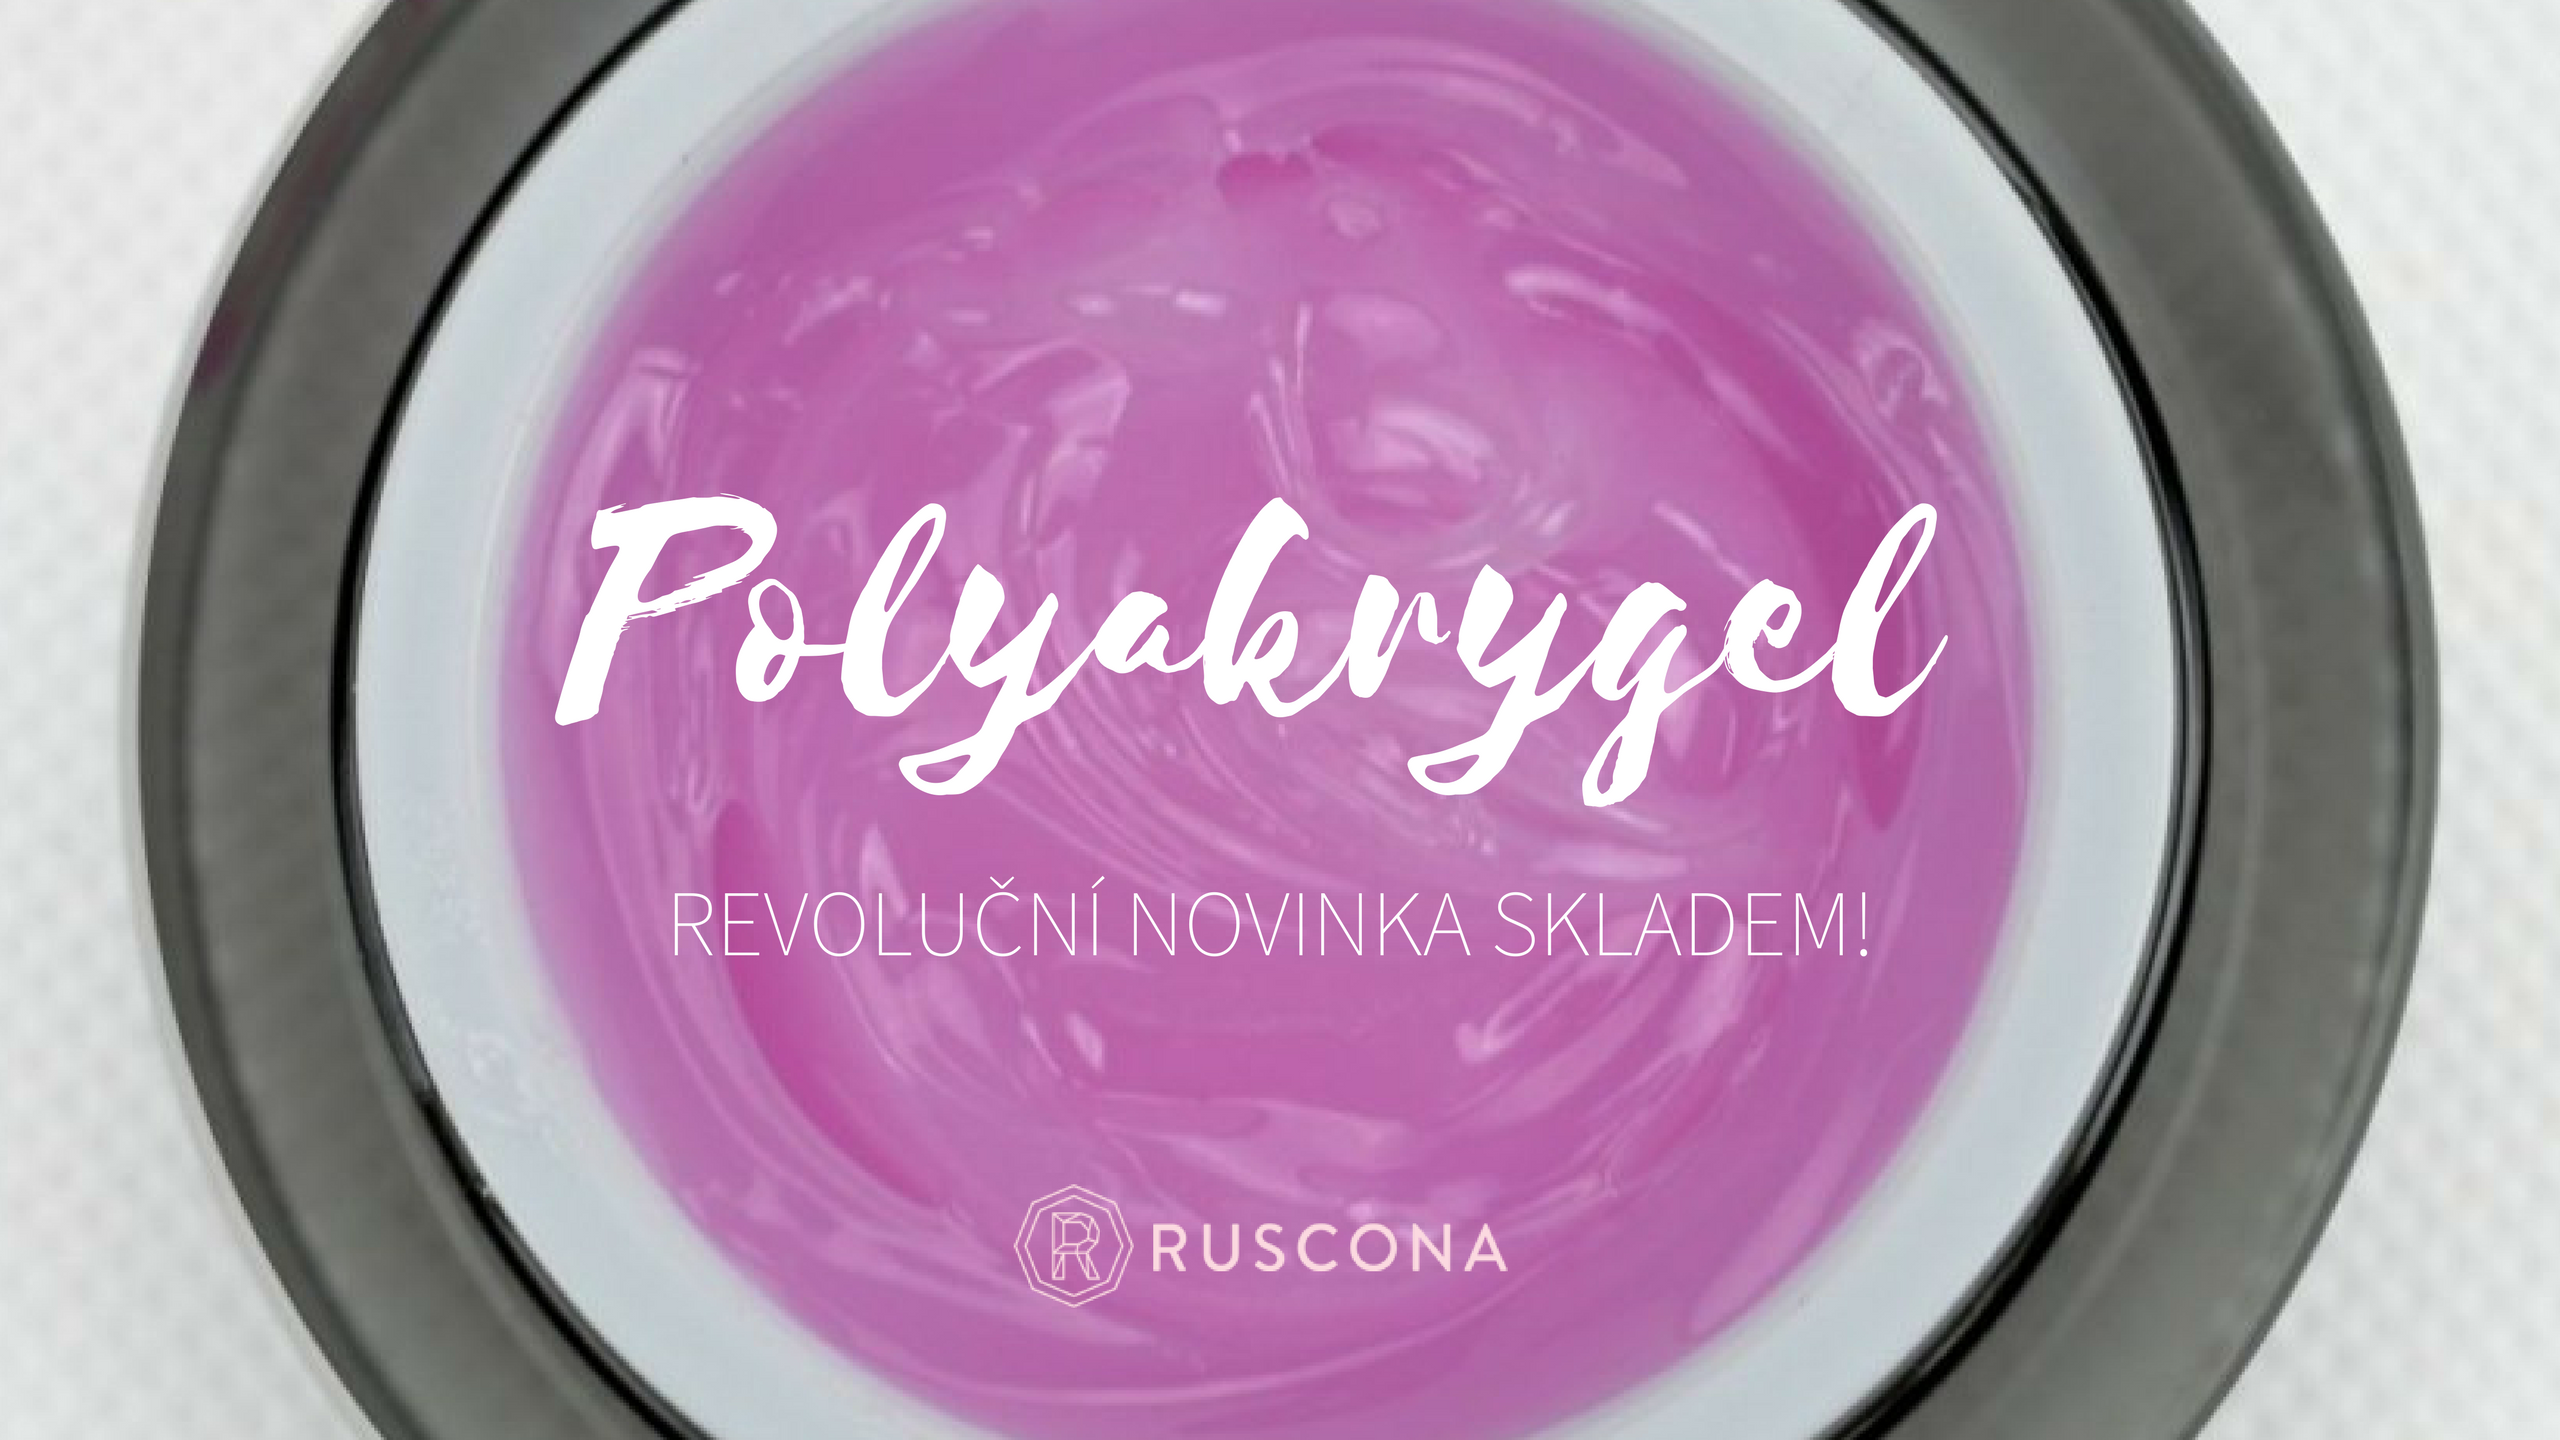 Polyakryl gel